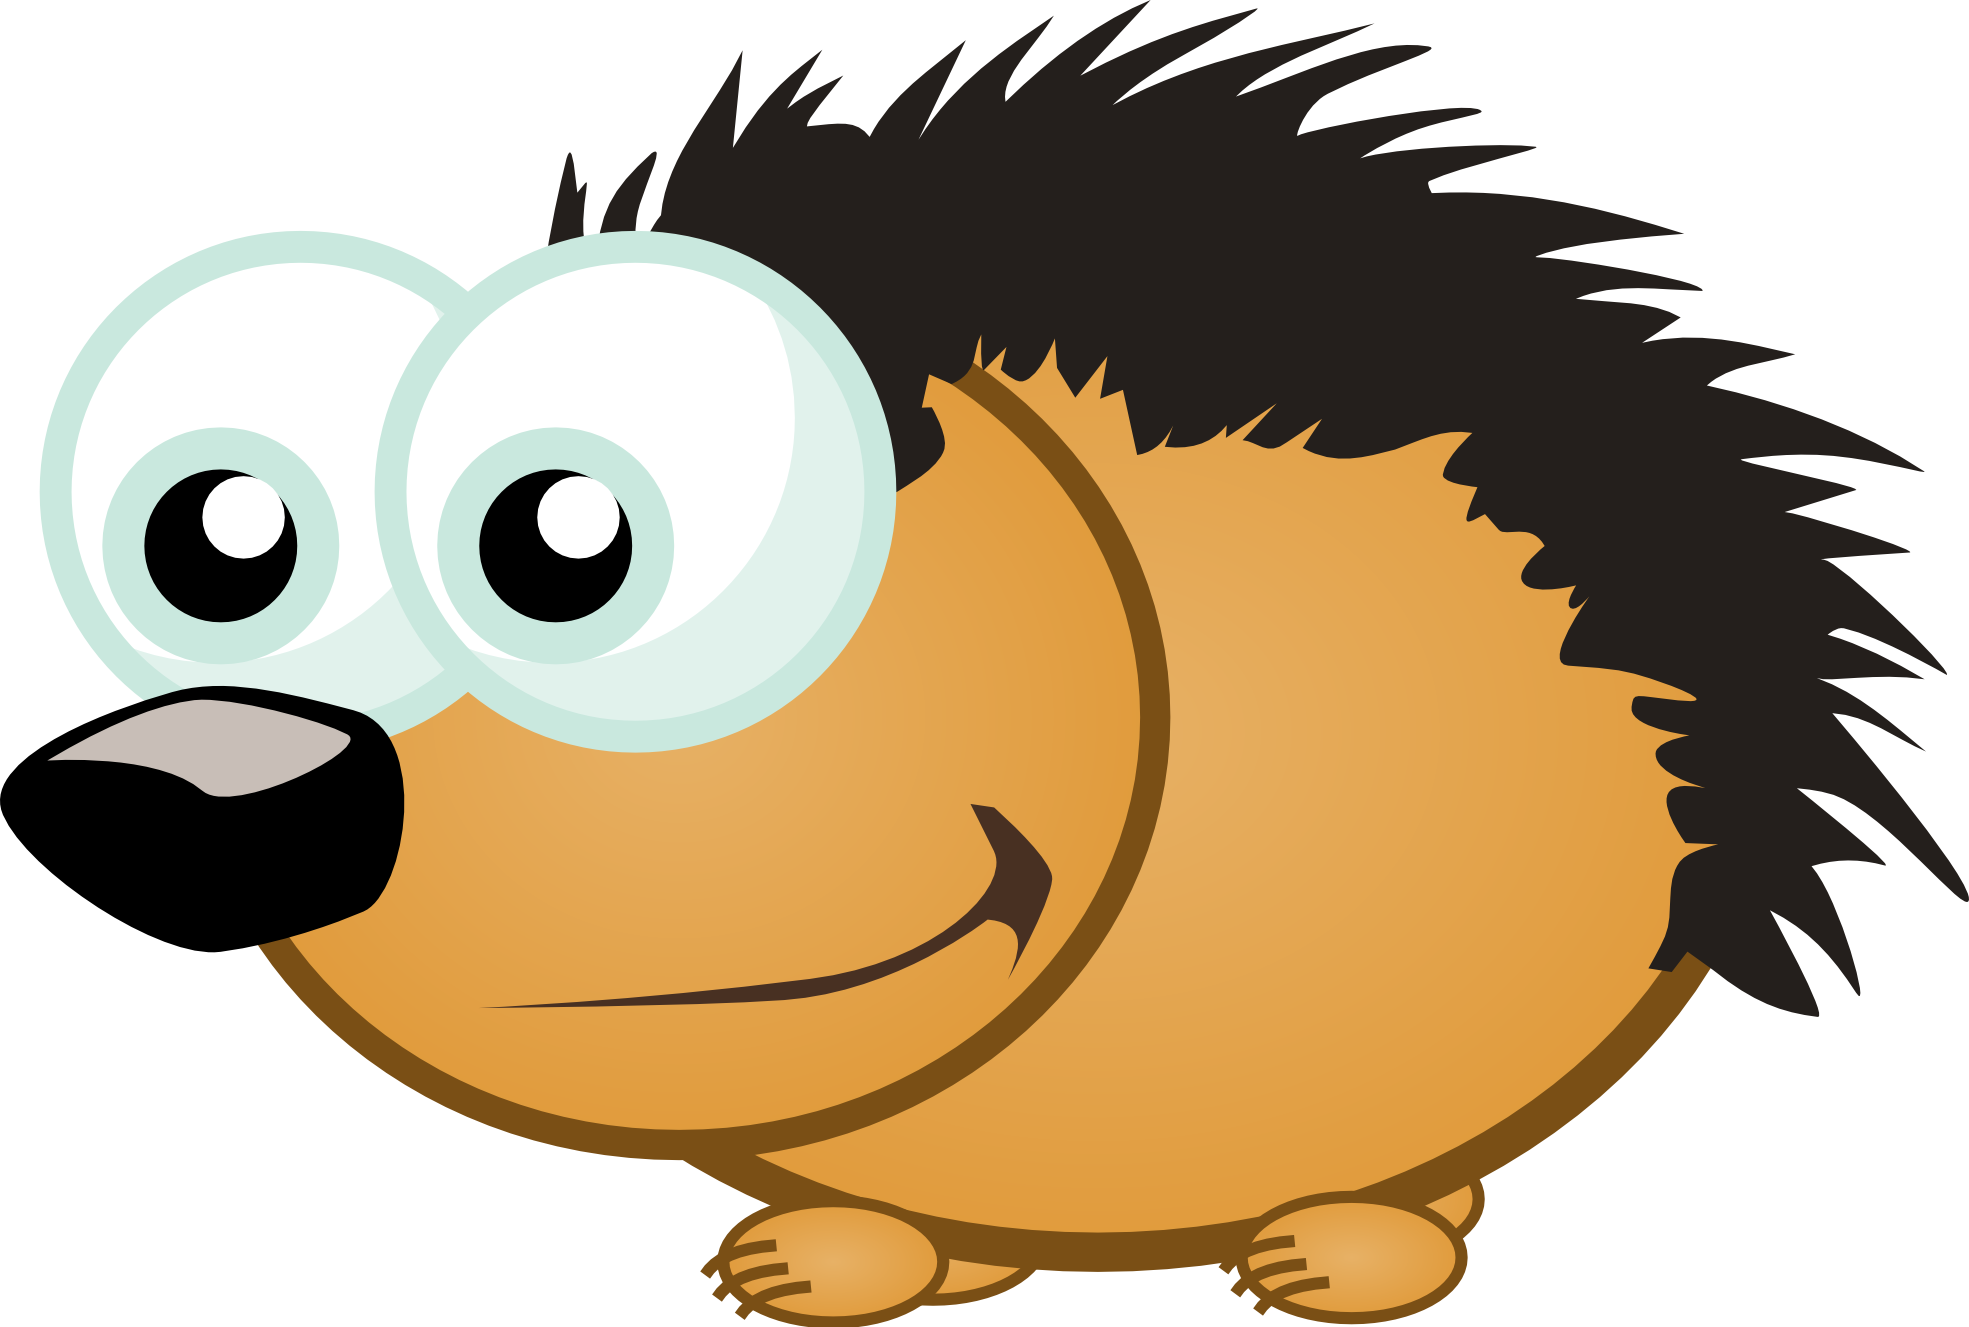 Porquipines clipart png transparent Porcupine Clip Art Free | Clipart Panda - Free Clipart Images png transparent